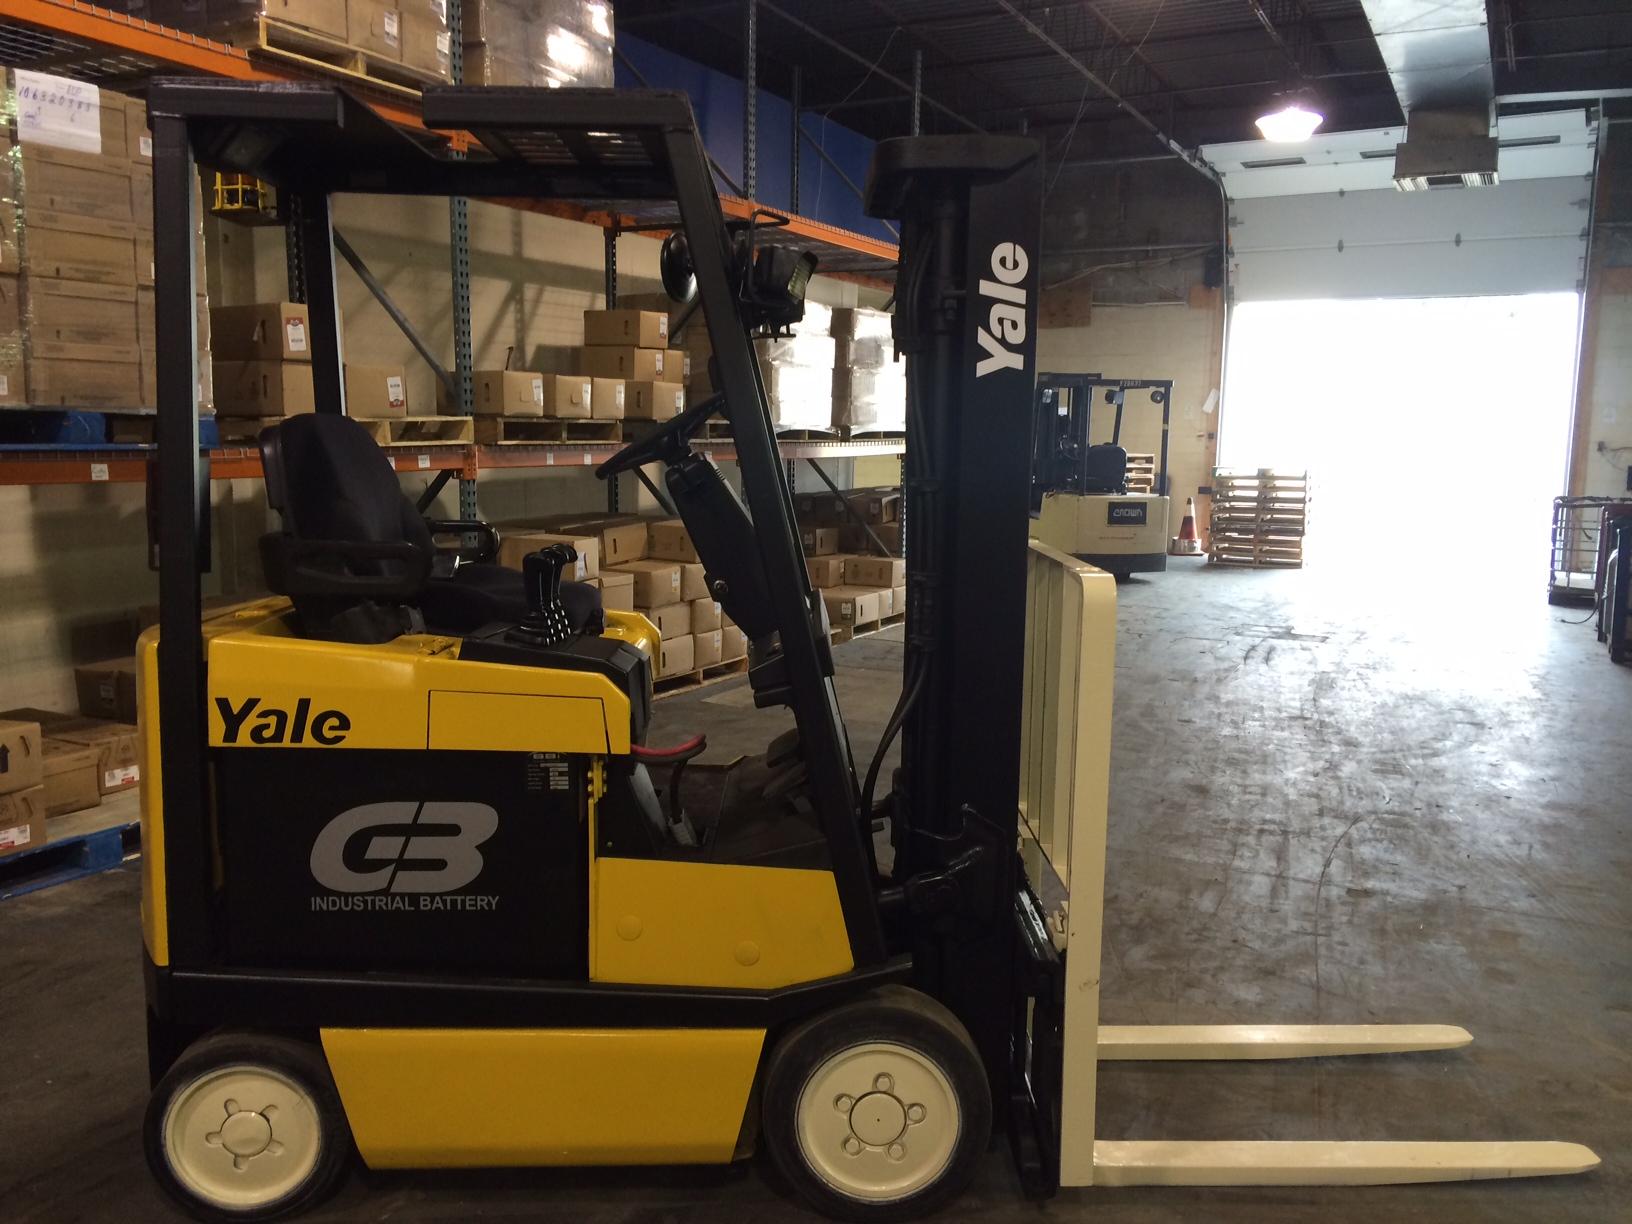 Forklift Batteries Forklift Battery Price List Gb Forklift Battery Sales New And Refurbished